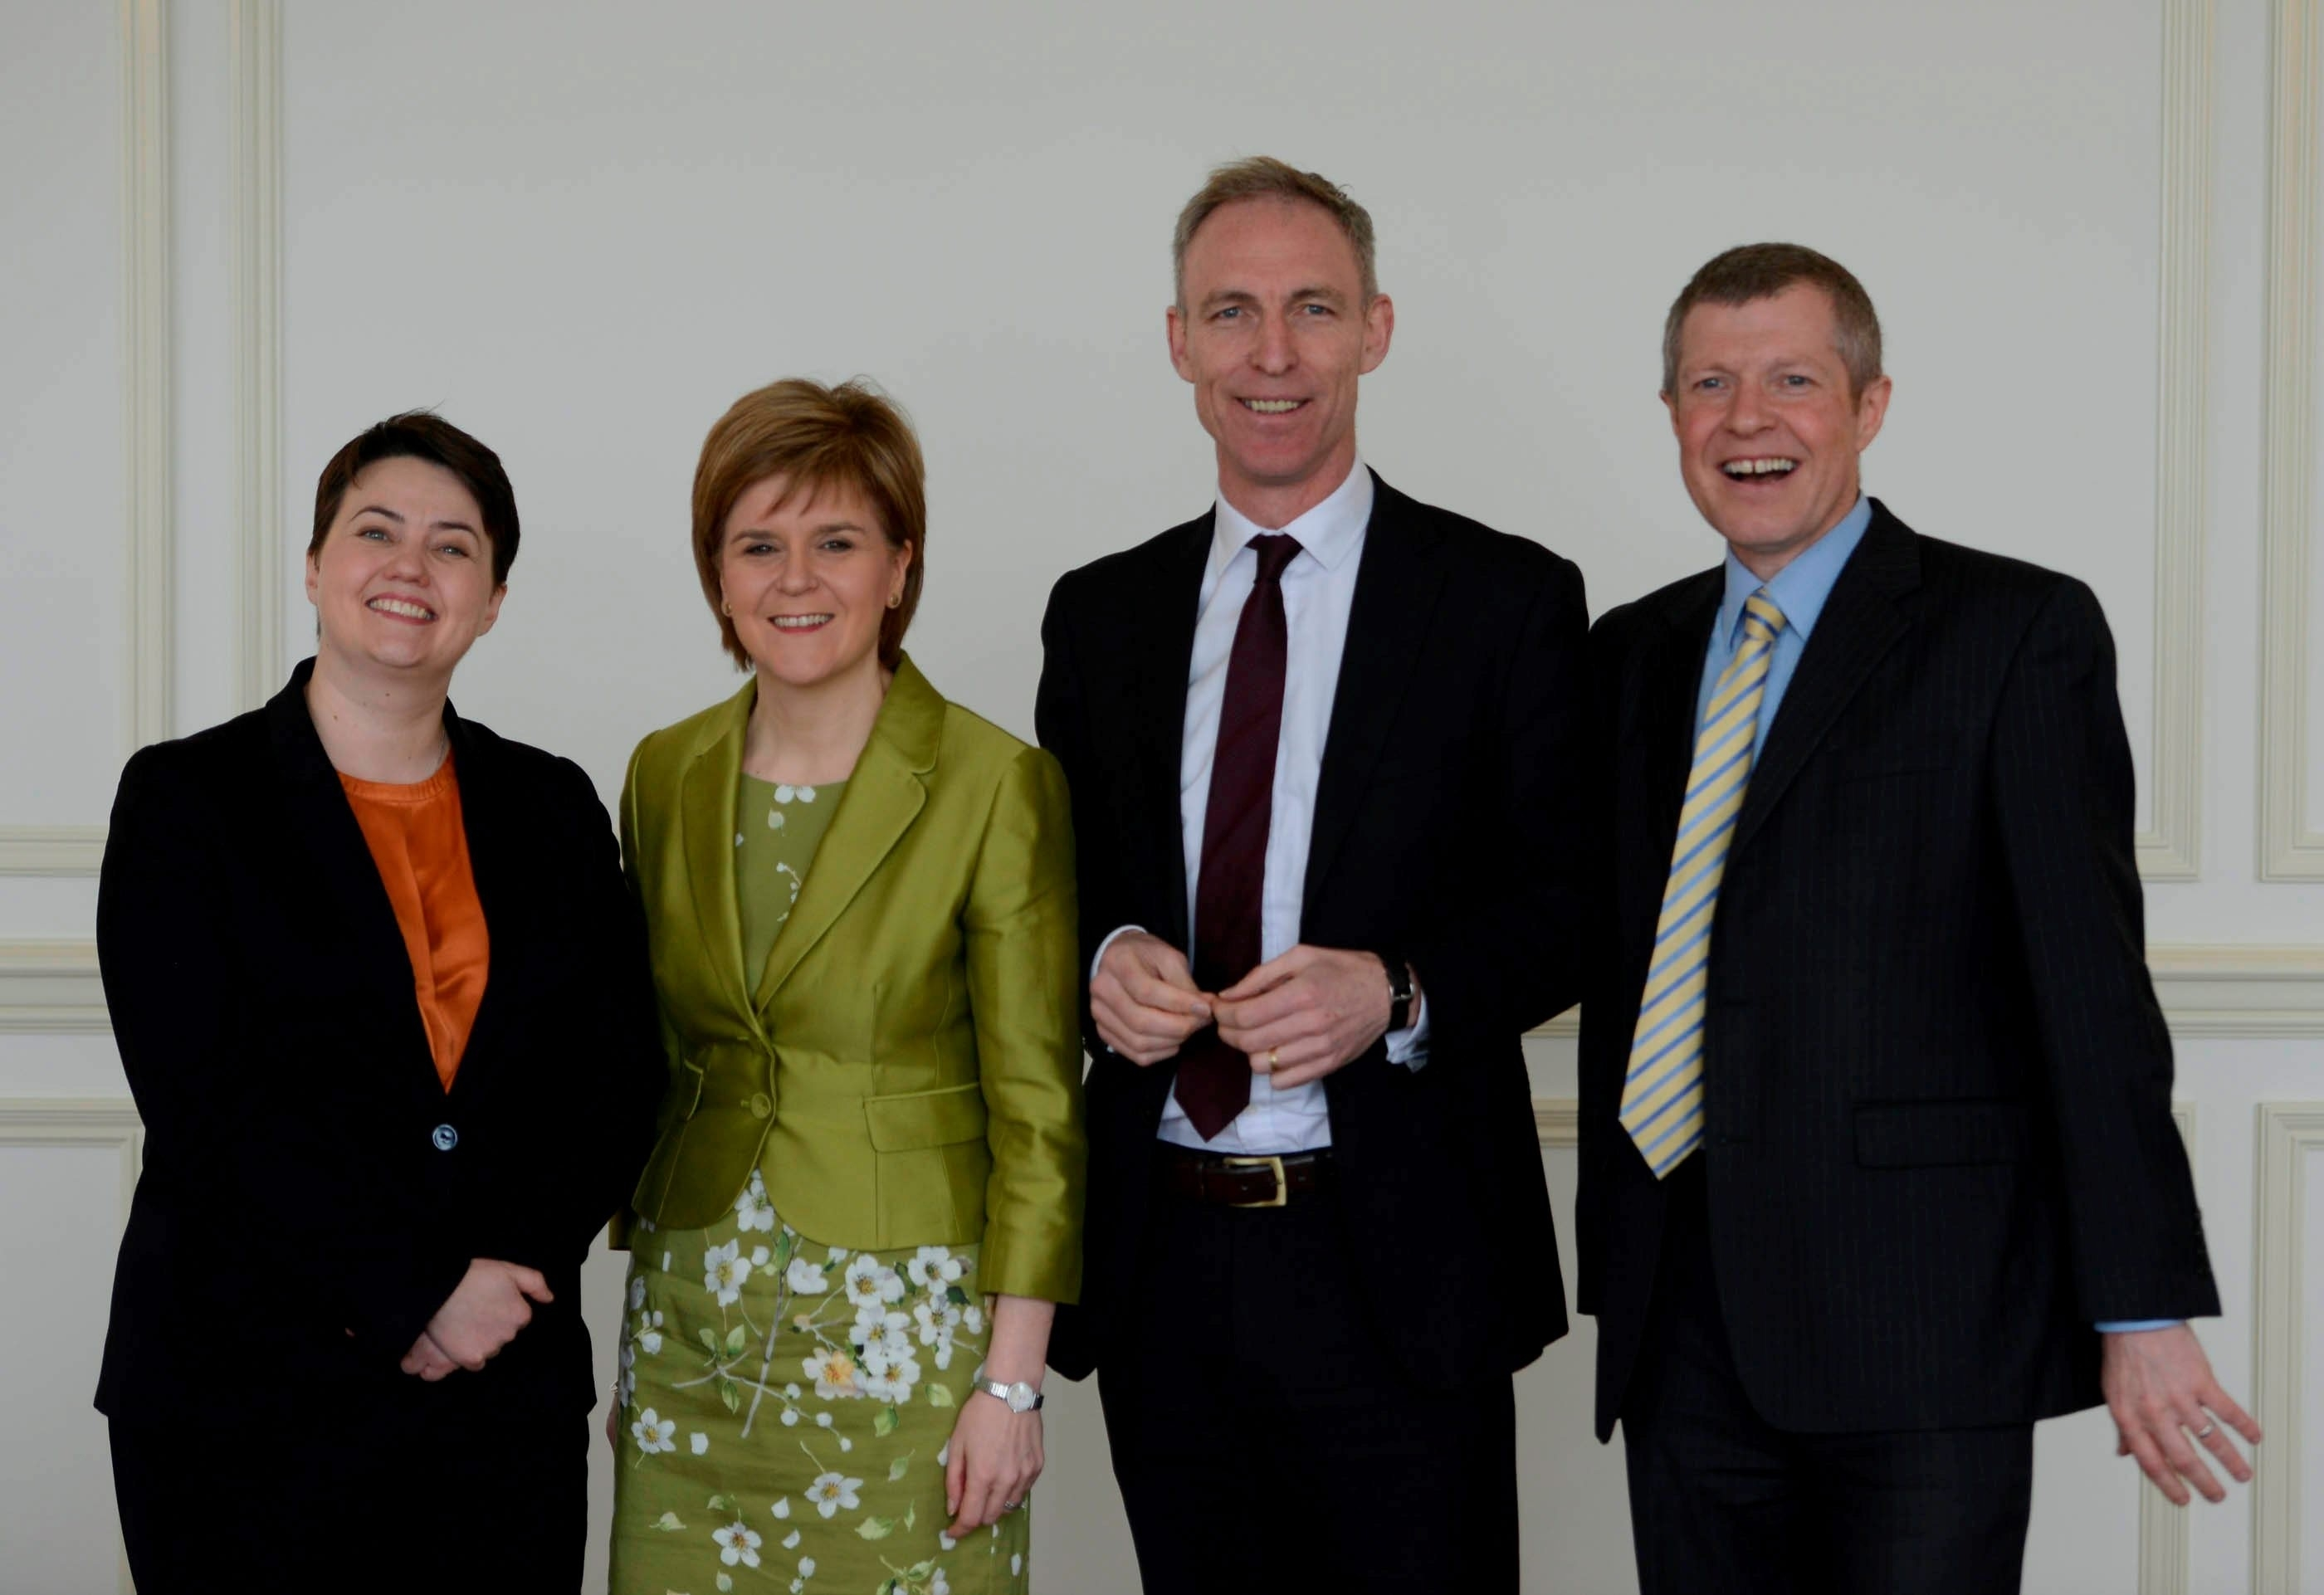 Scotland Debates